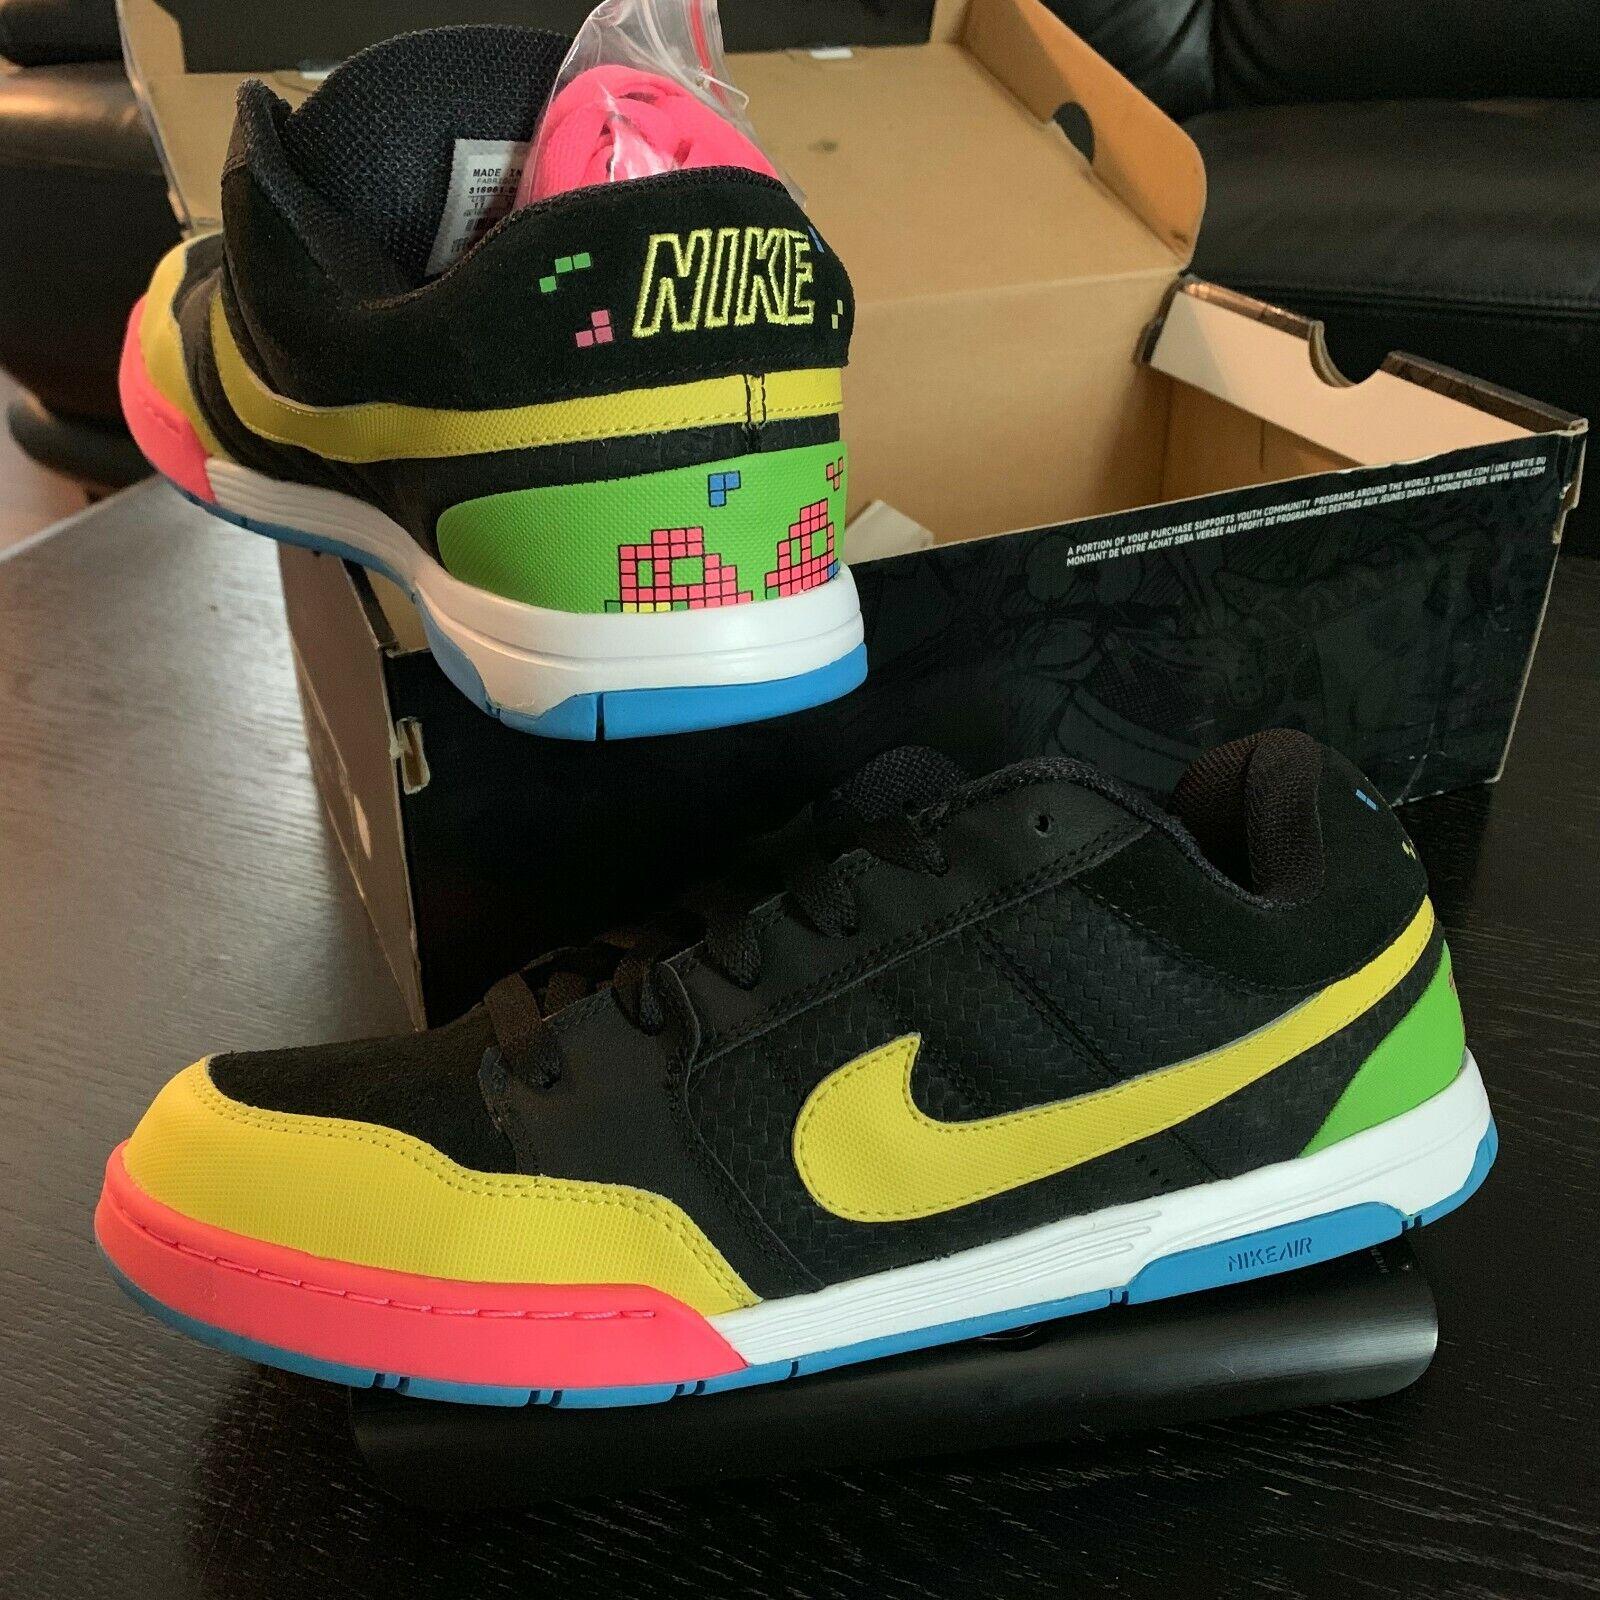 Nike Air Mogan Premium (Tetris) Mens Size US 11 - BRAND NEW  SUPER RARE  316961